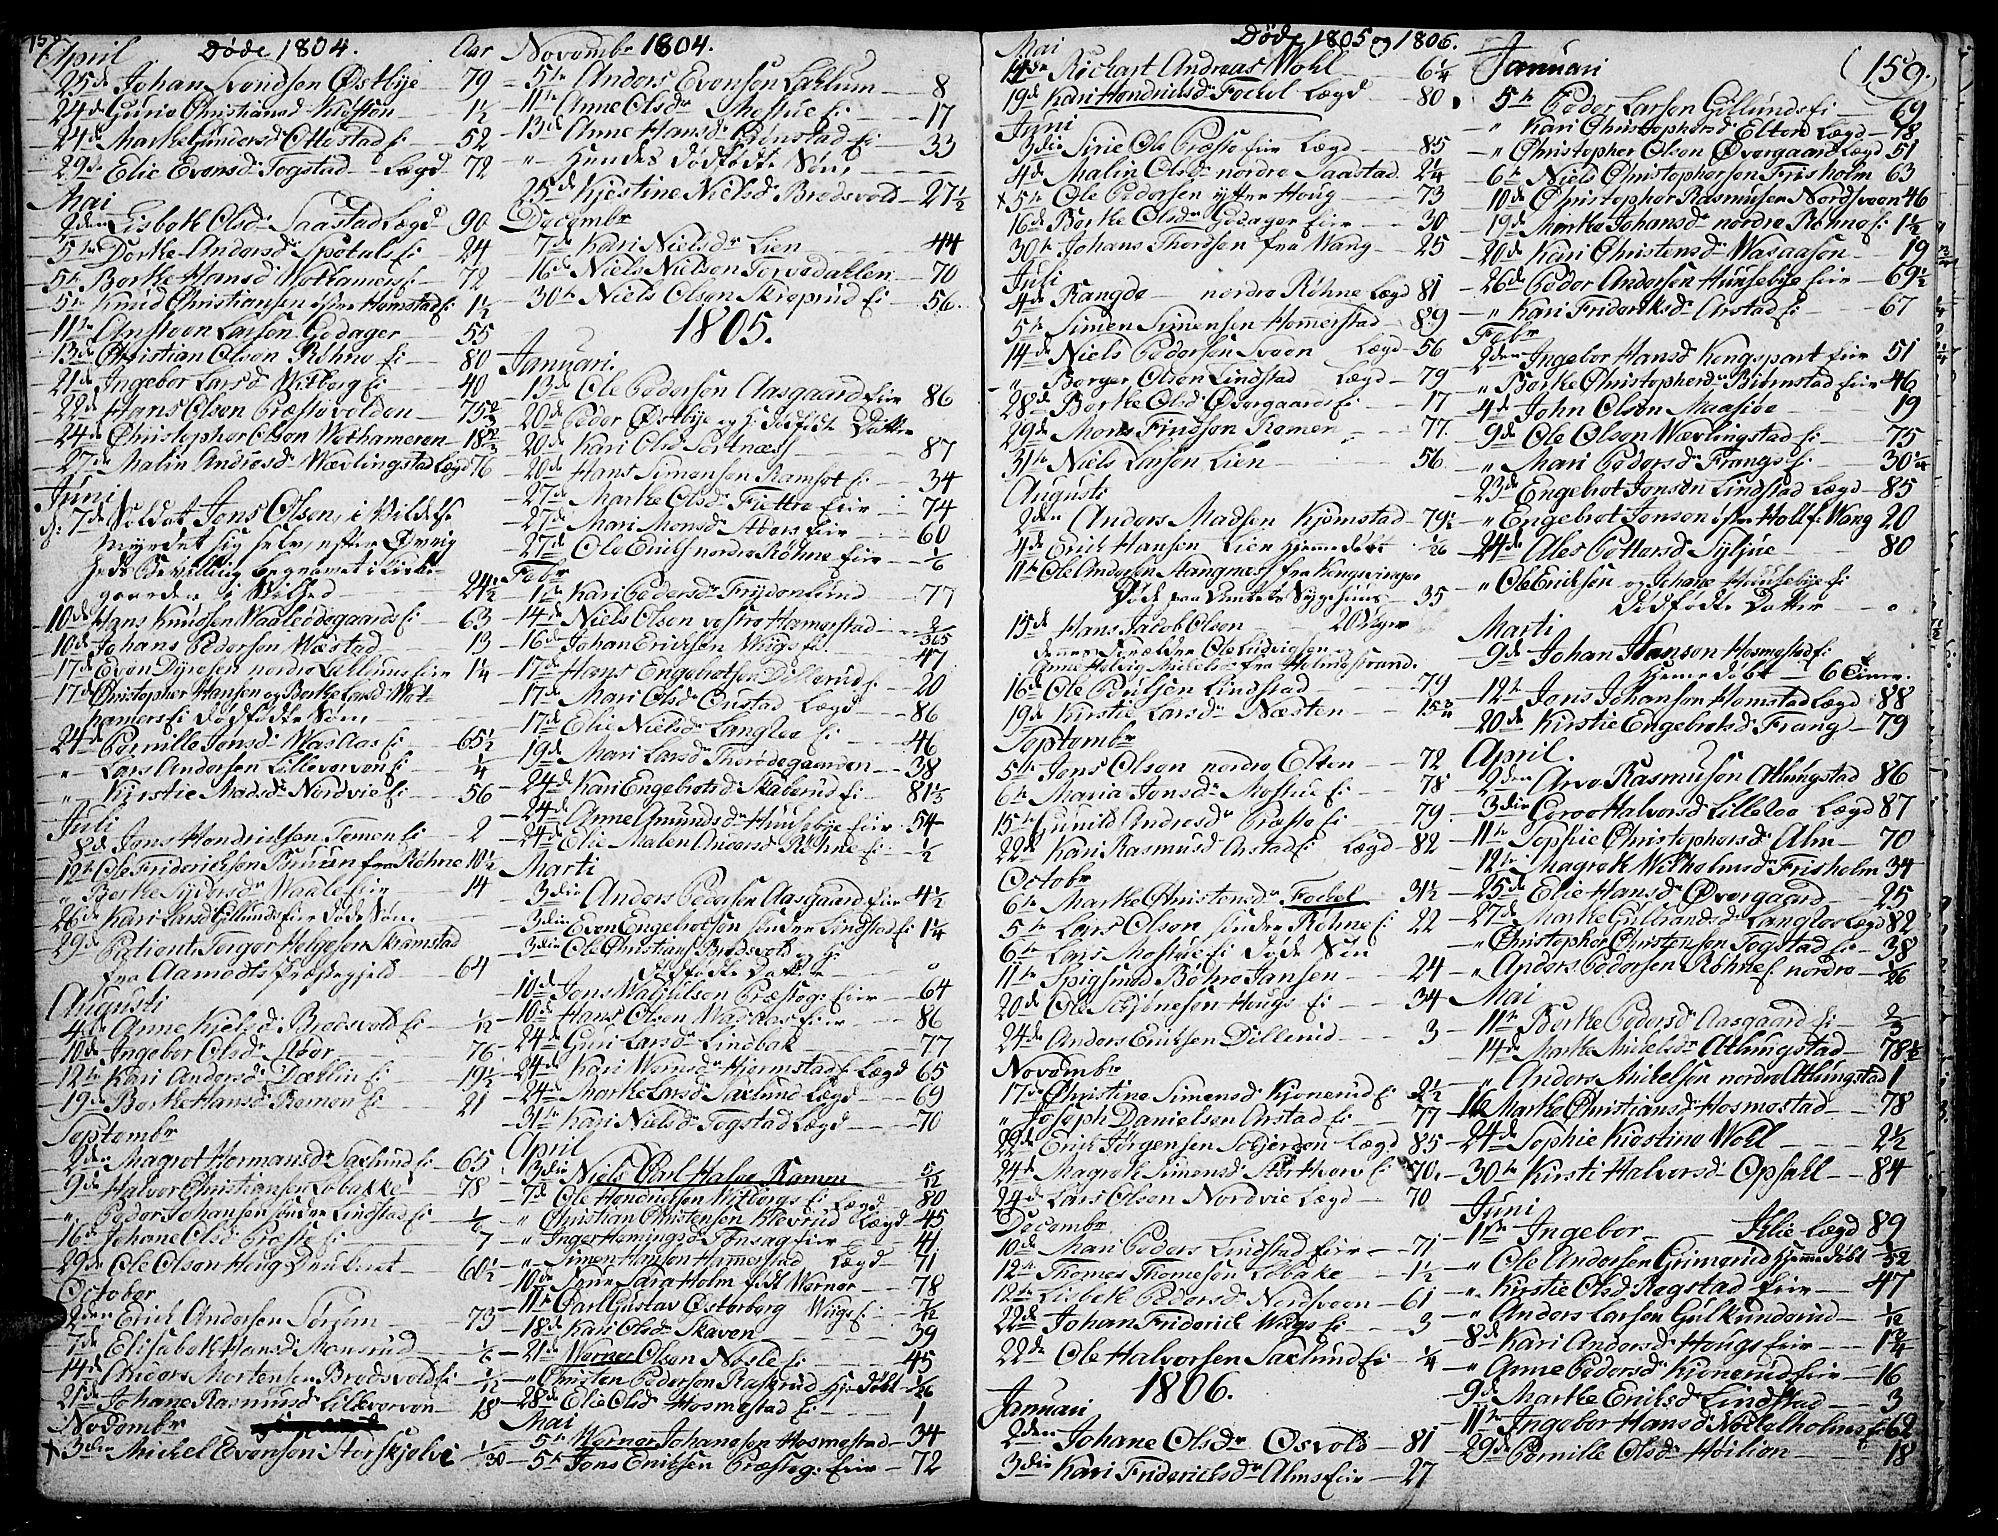 SAH, Stange prestekontor, K/L0007: Ministerialbok nr. 7, 1788-1813, s. 158-159